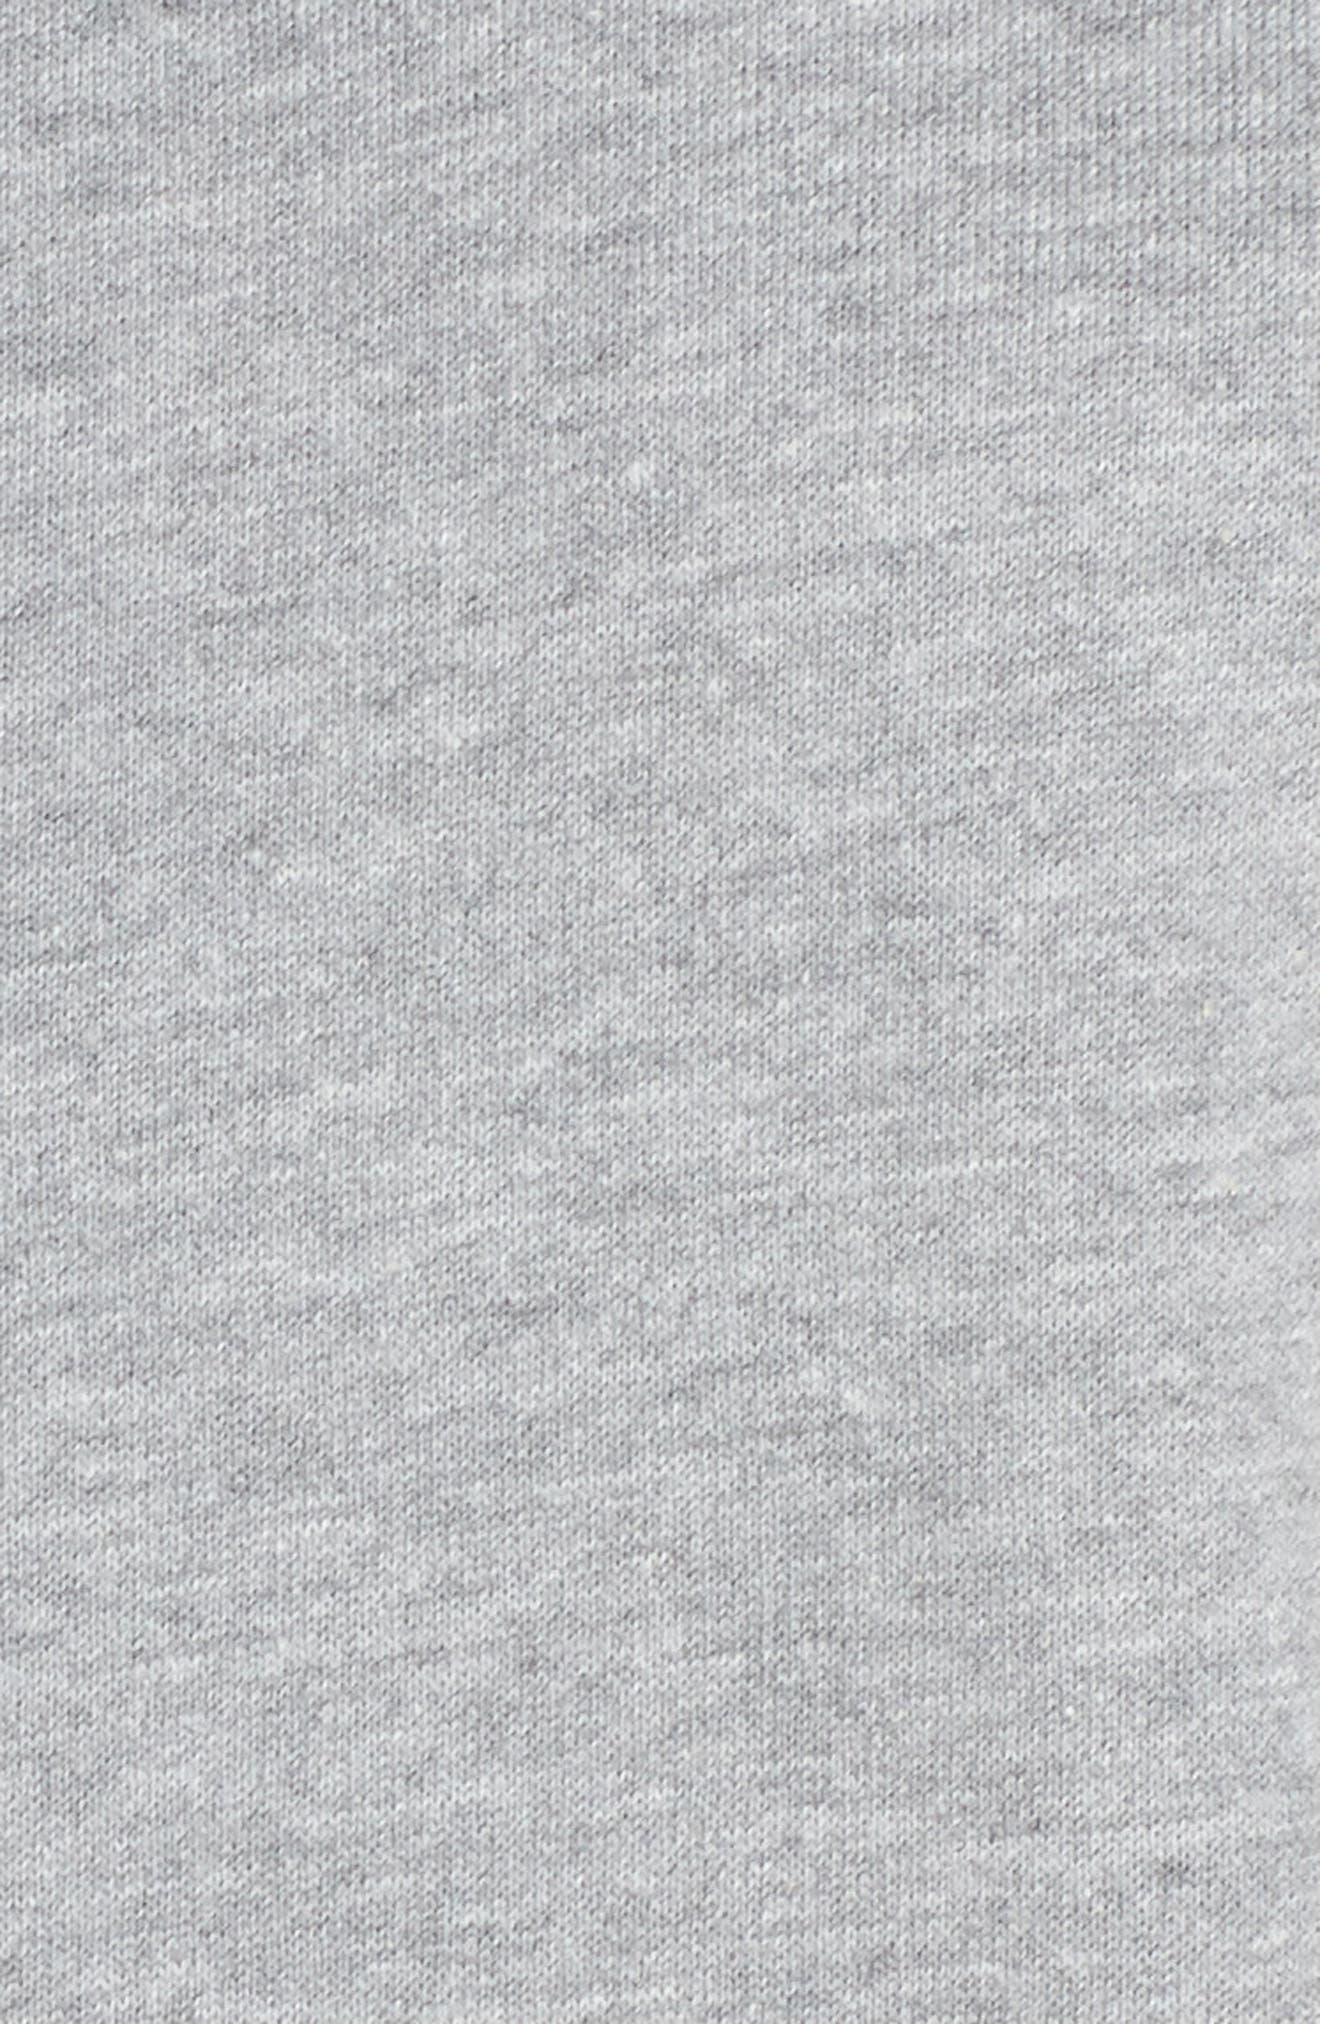 Crop Lounge Sweatshirt,                             Alternate thumbnail 5, color,                             025